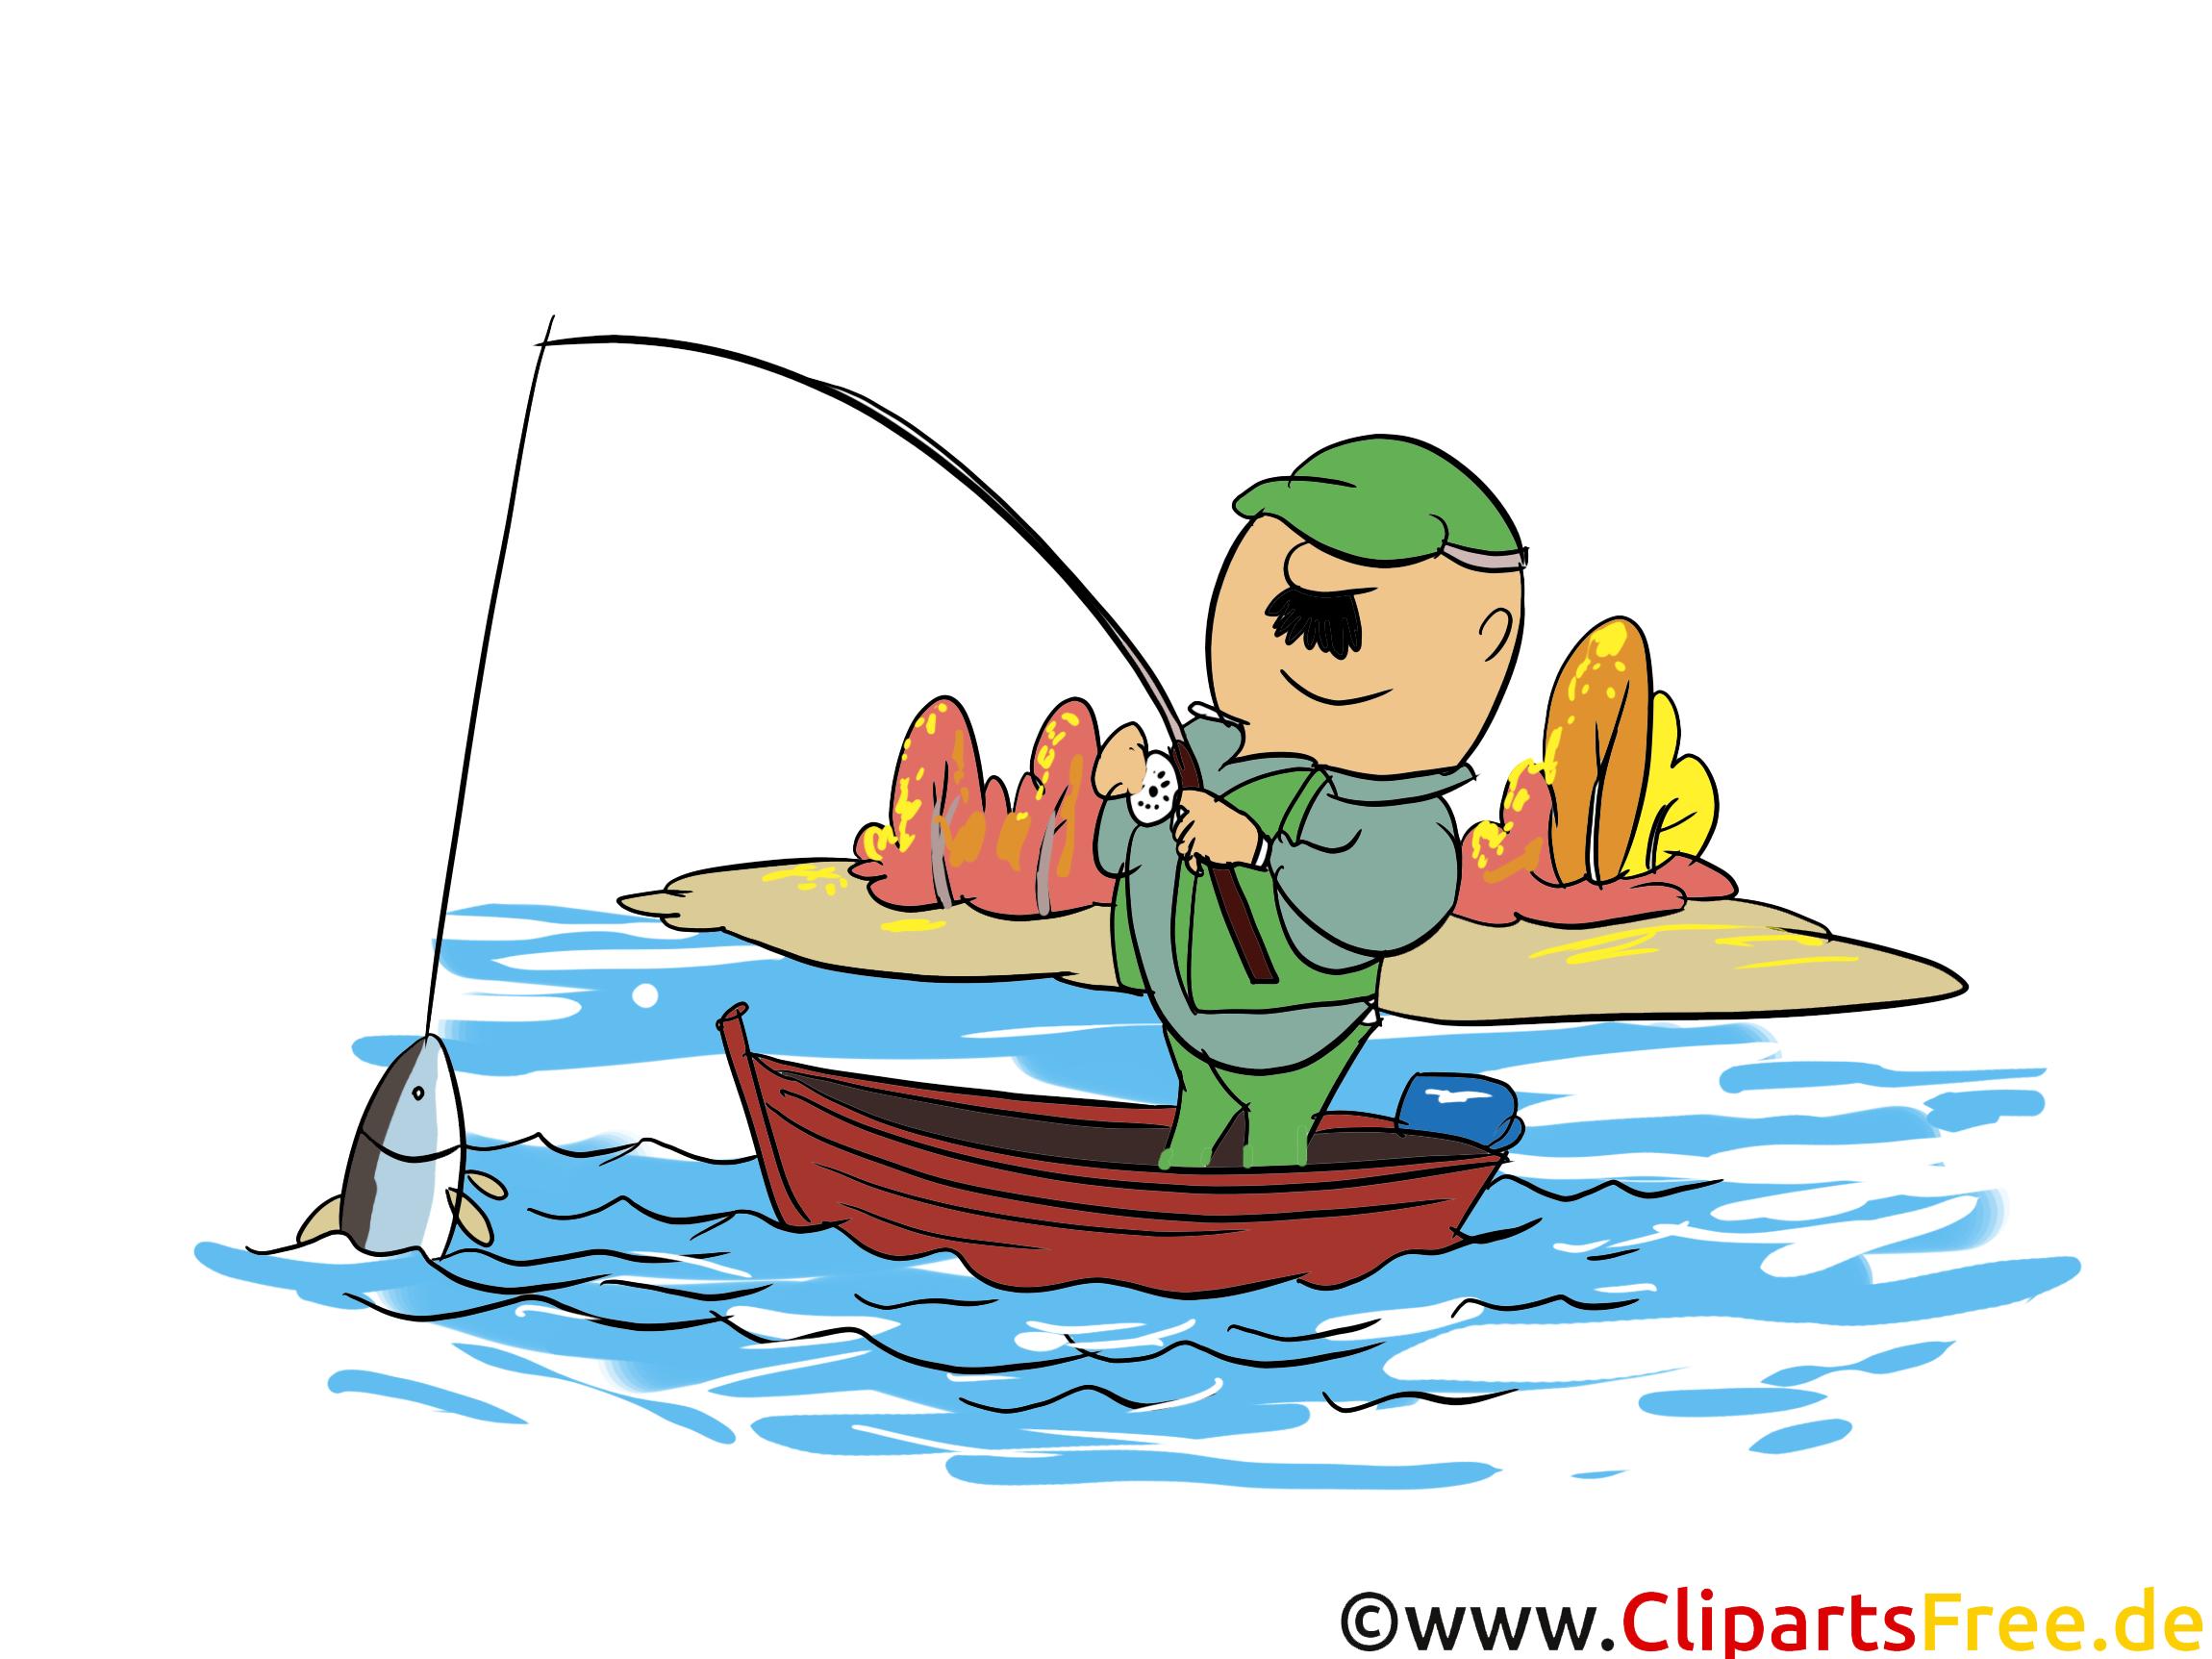 Angeln auf See Clipart, Illustration, Bild, Grafik, Cartoon